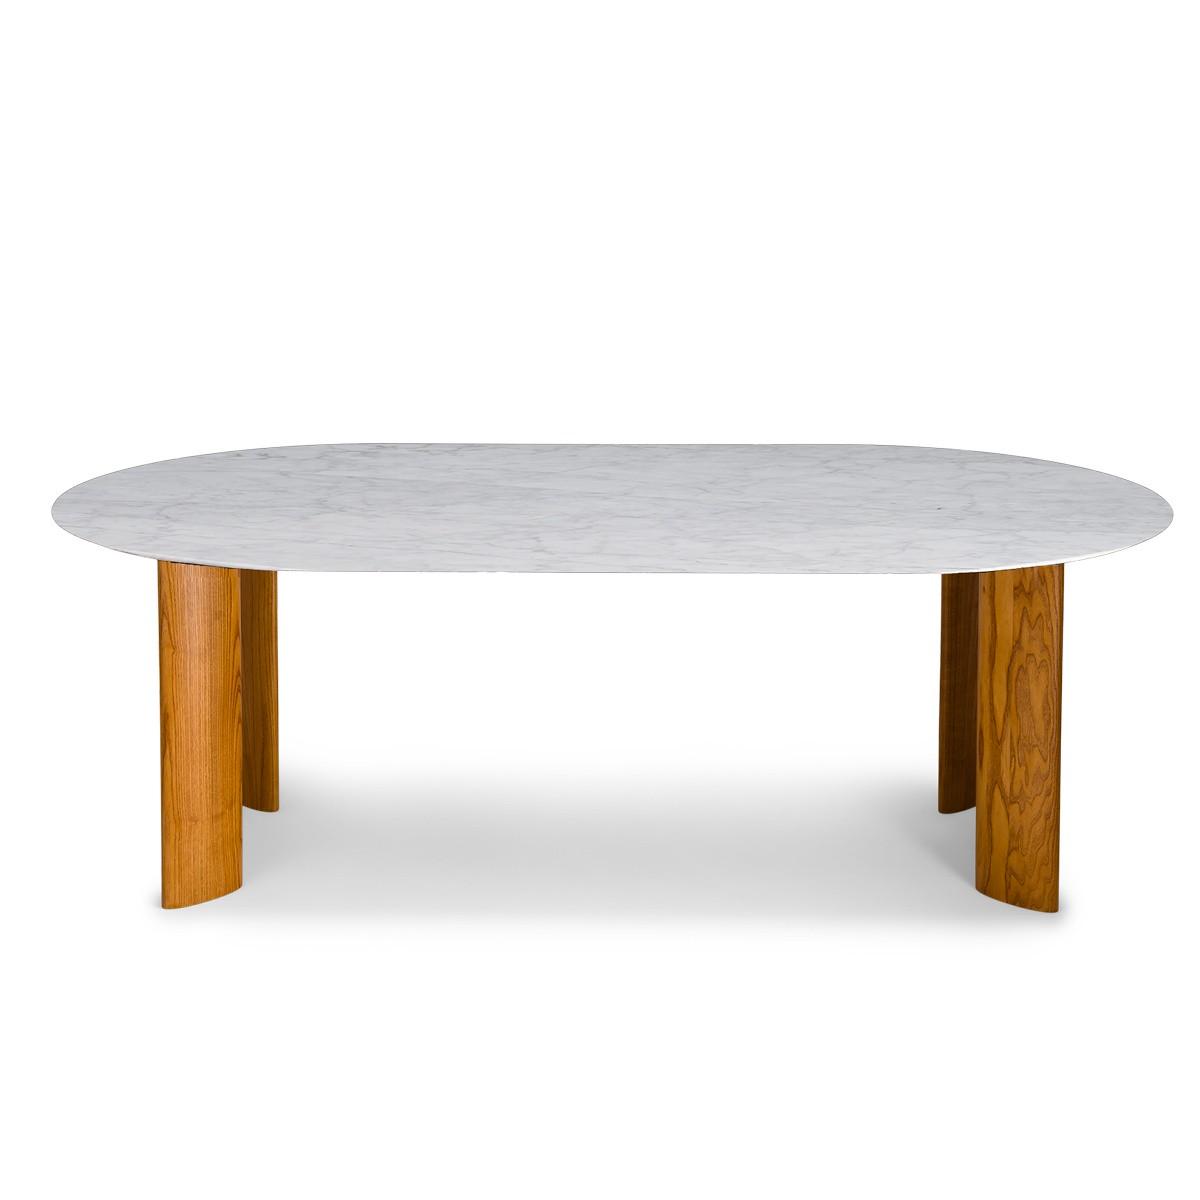 Carlotta Alta Dining Table White Marble and Iroko Finish Legs - 8 Seats